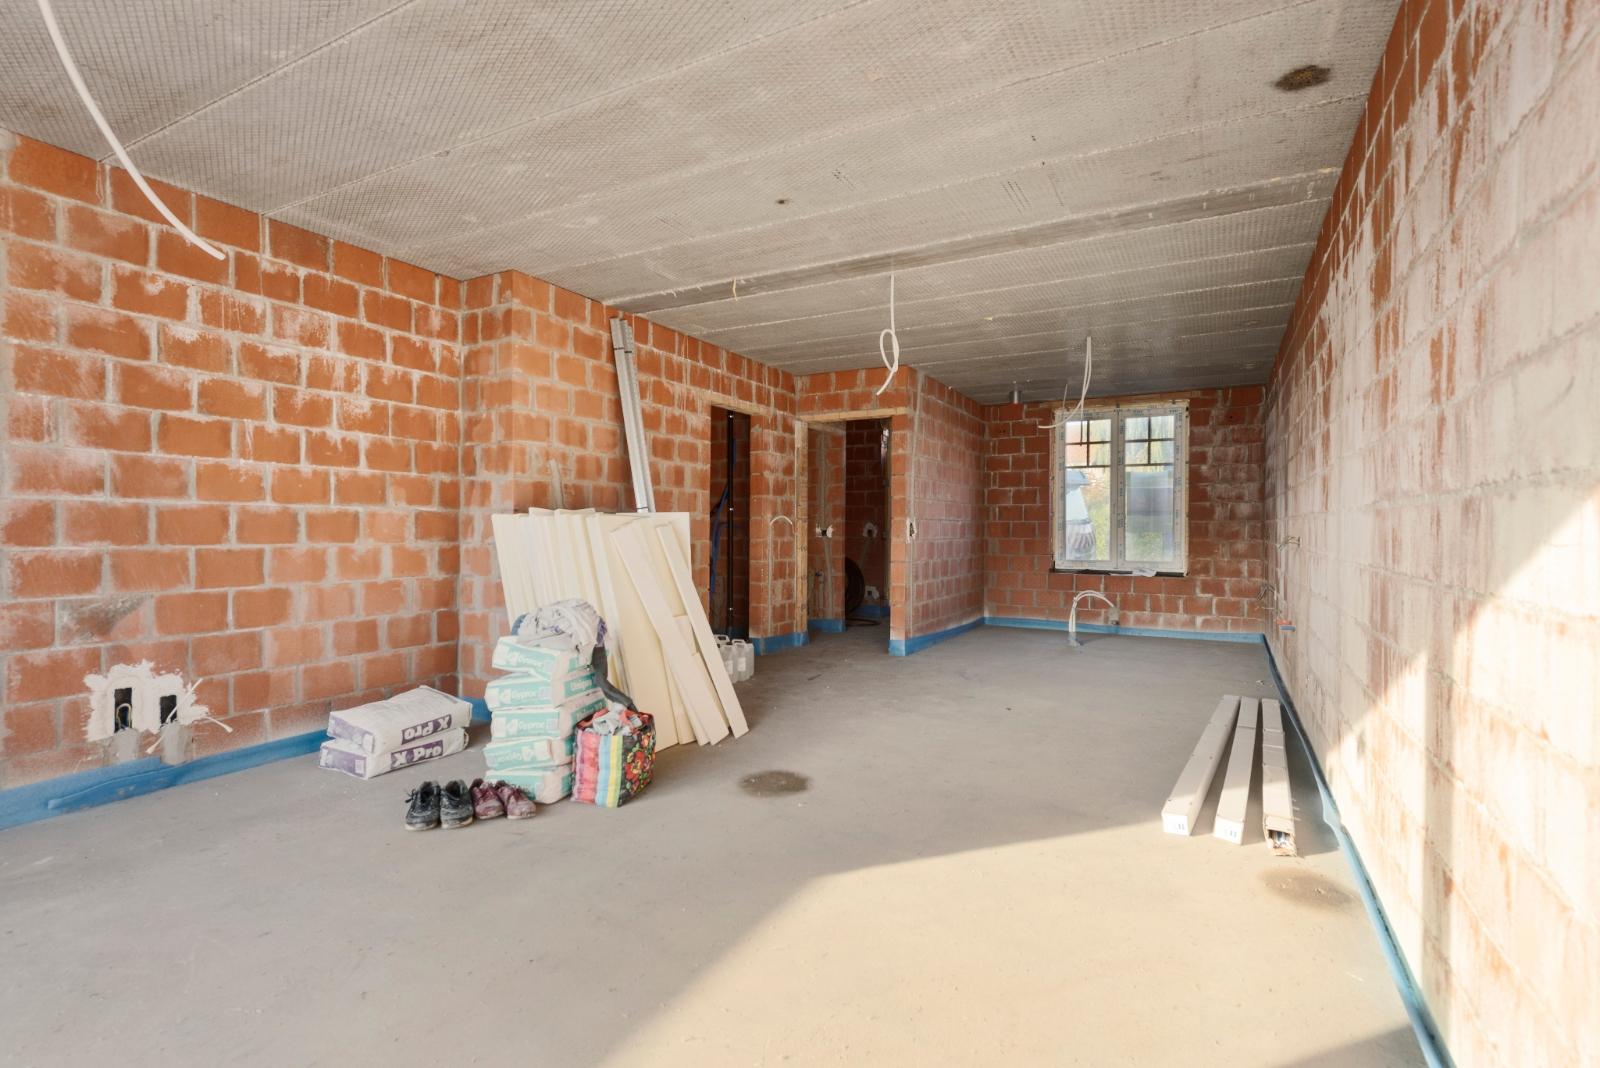 Kwaliteitsvolle nieuwbouwwoning in centrum Leke - 4